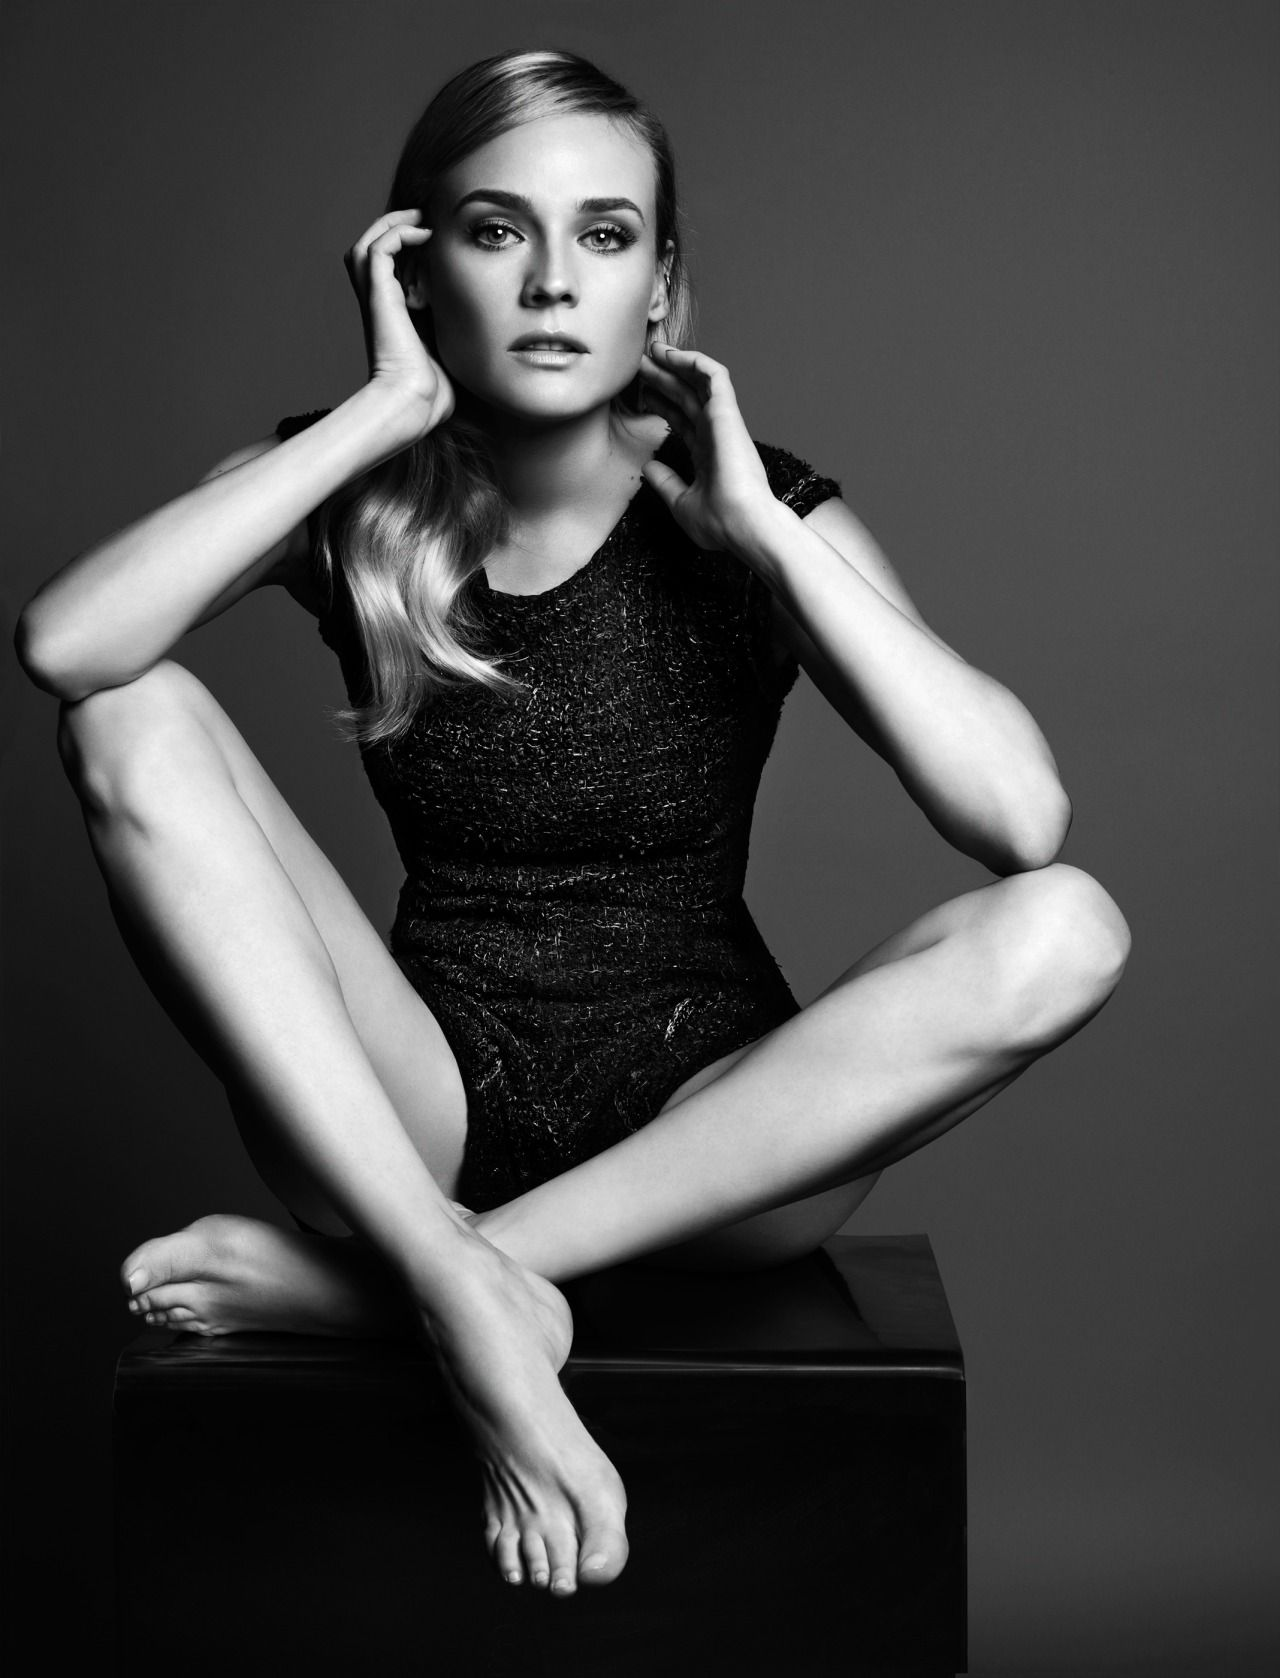 Paparazzi Jana Kruger nudes (26 images), Instagram